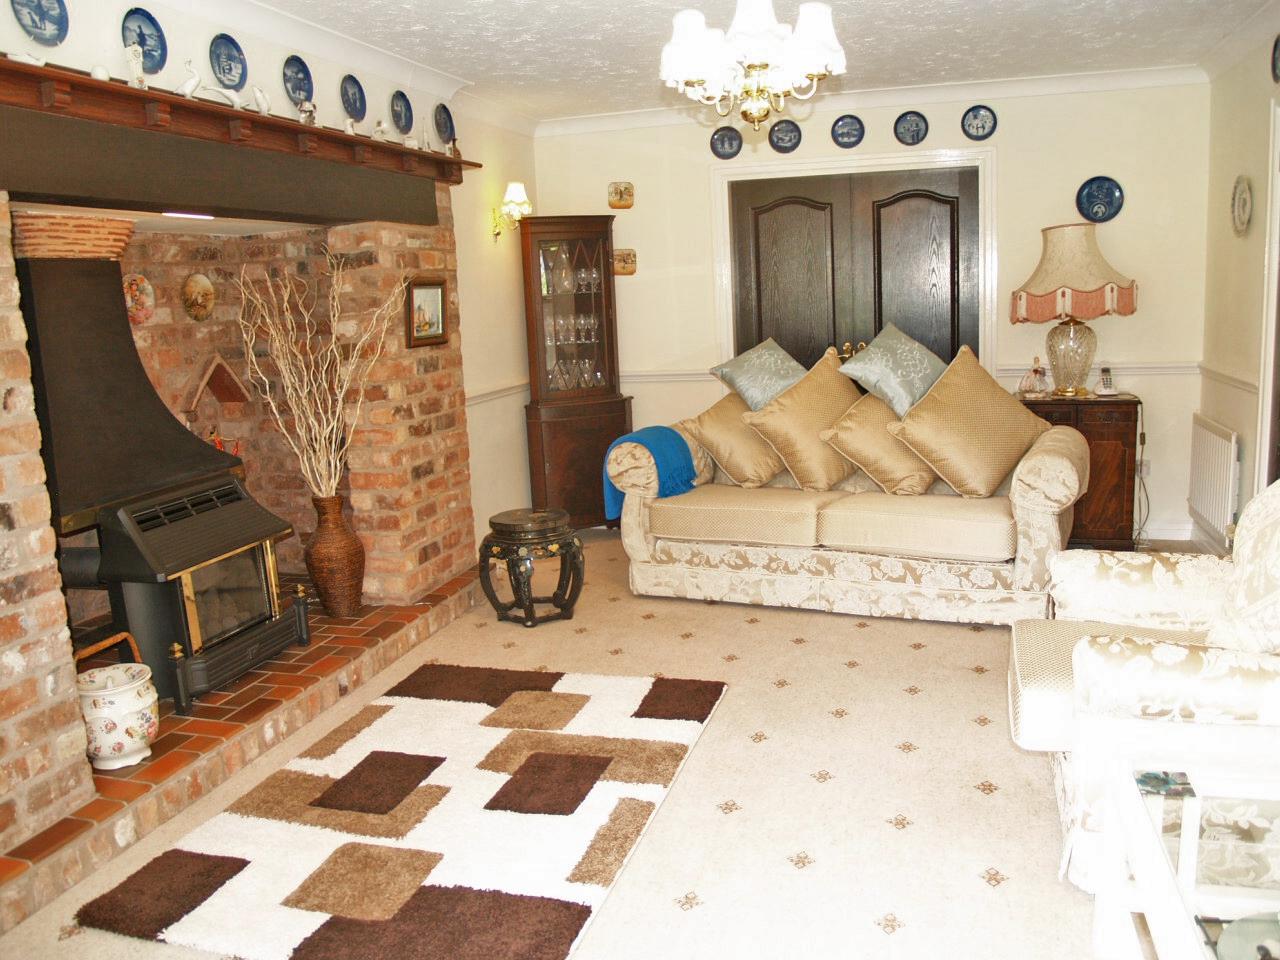 4 bedroom detached house SSTC in Birmingham - photograph 5.